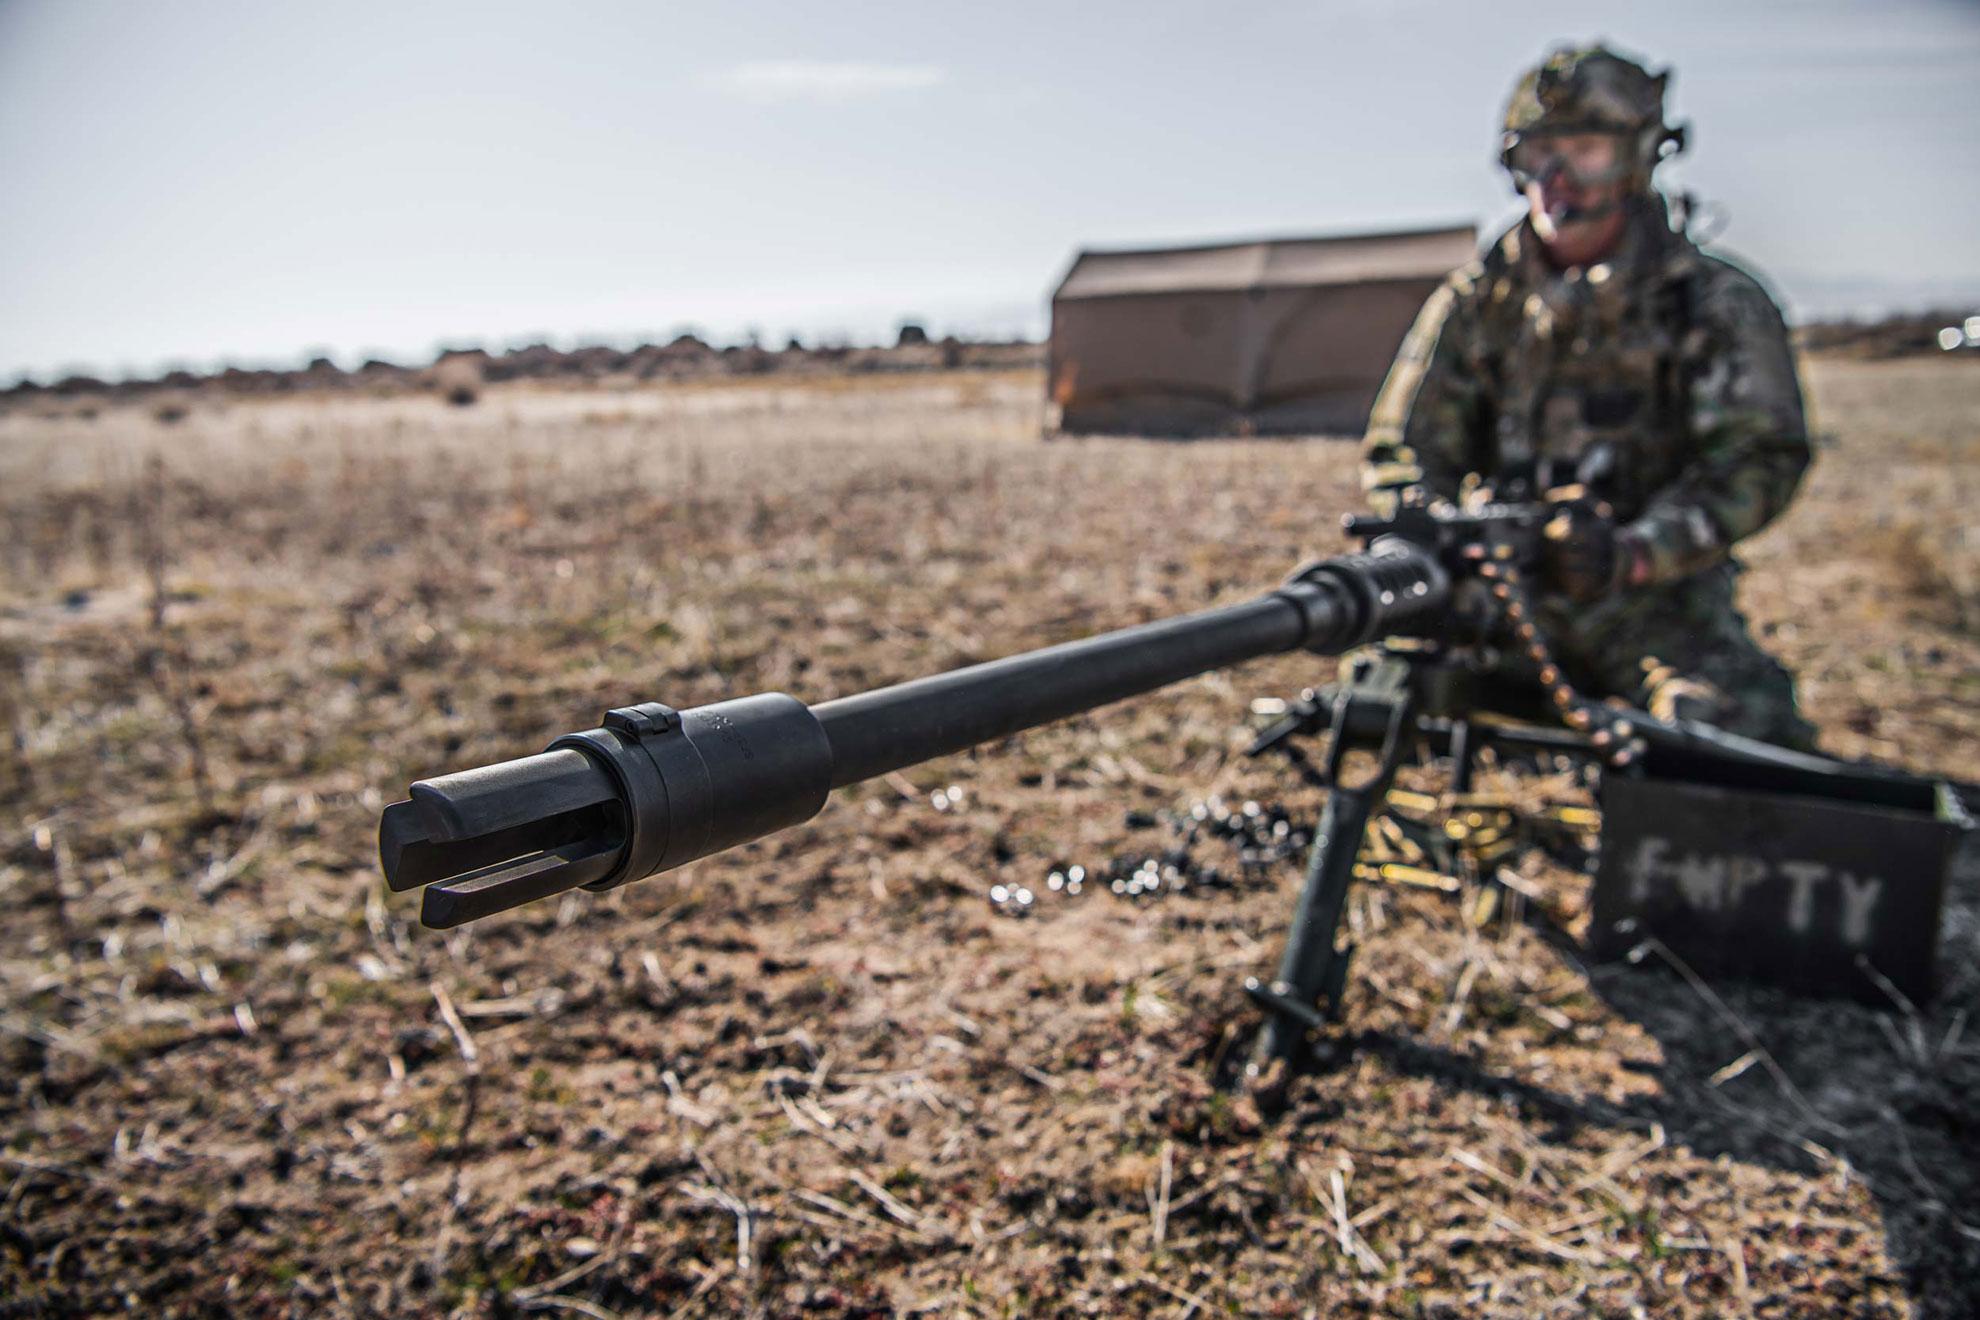 Surefire SF3P-50BMG flash hider for the M2 Browning machine gun